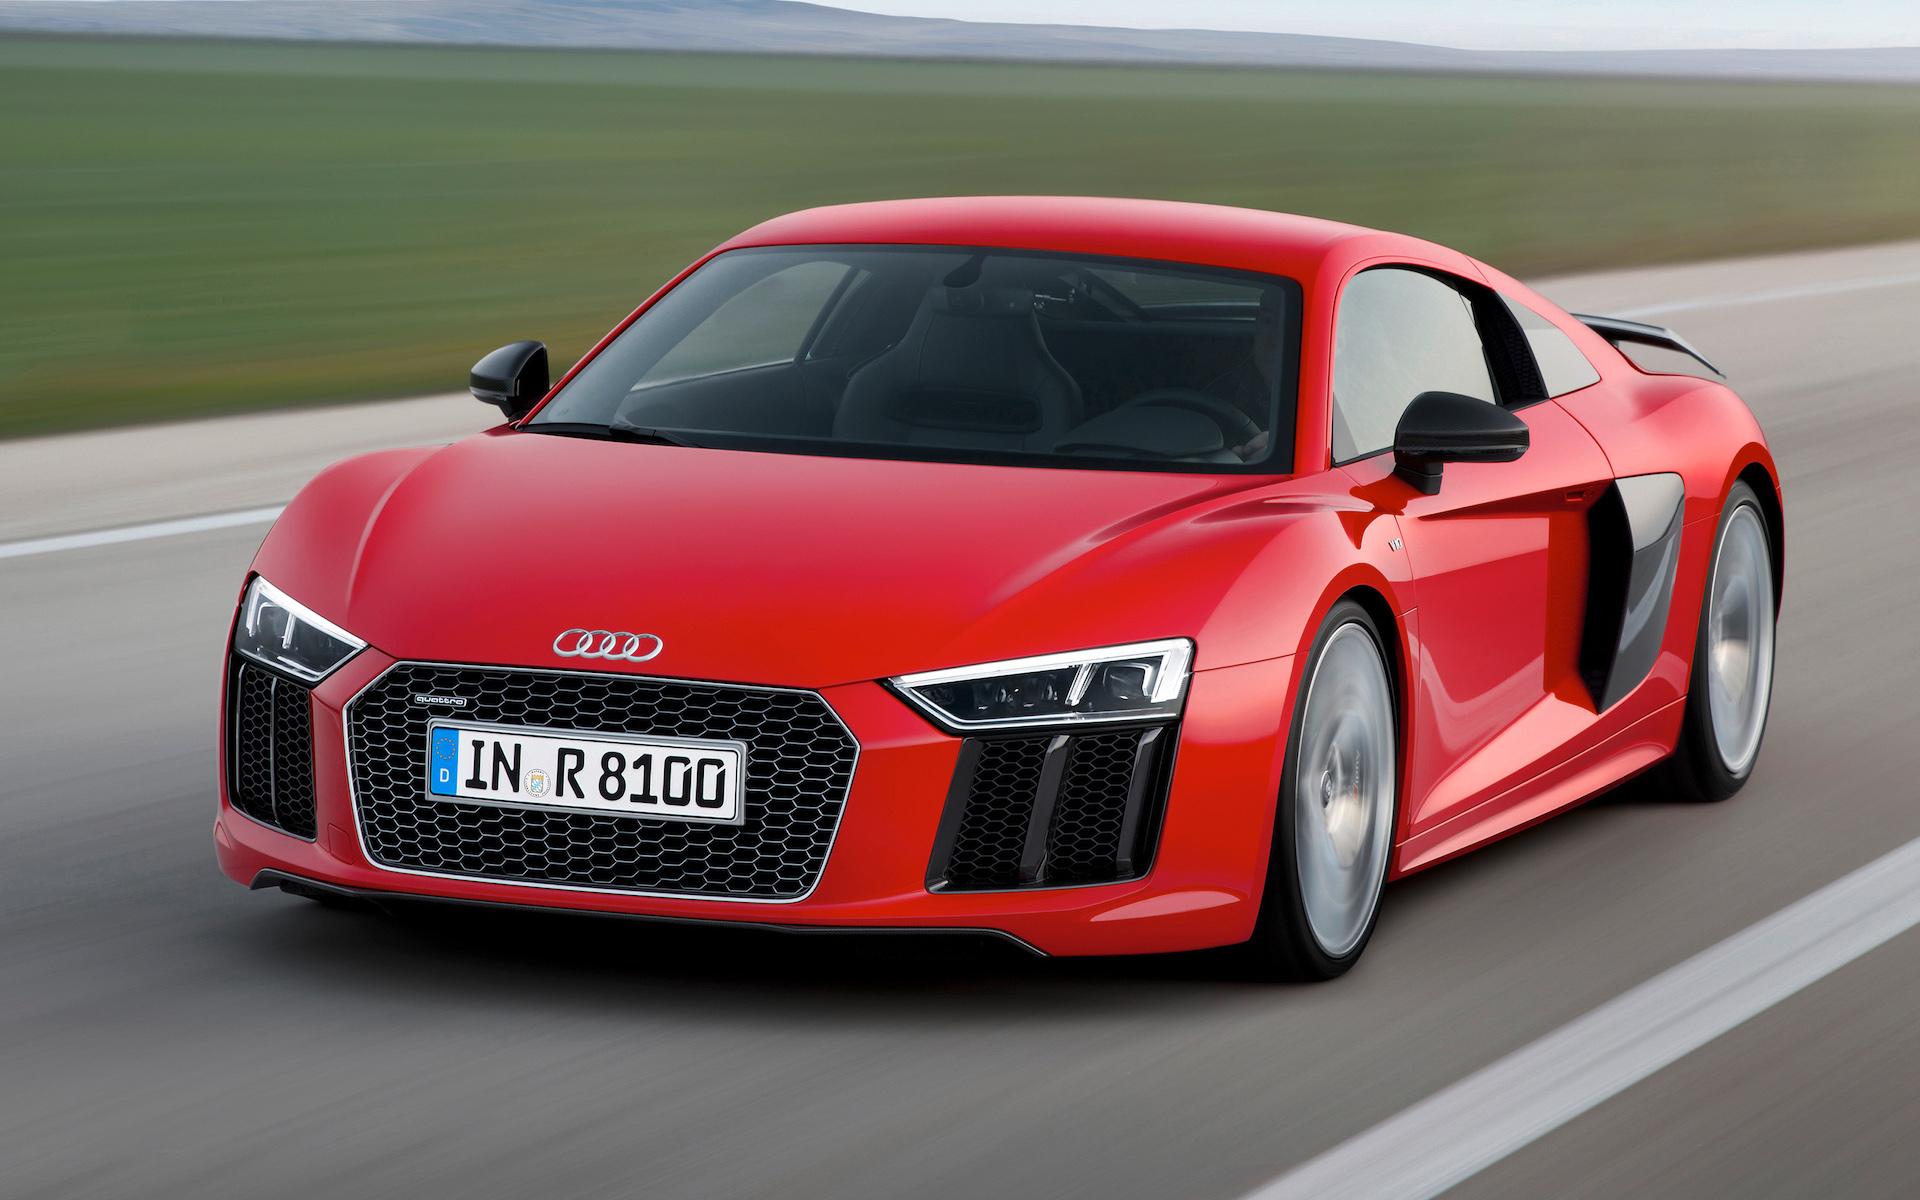 2016 Audi R8 Car HD Wallpaper FullHDWpp   Full HD Wallpapers 1920x1200